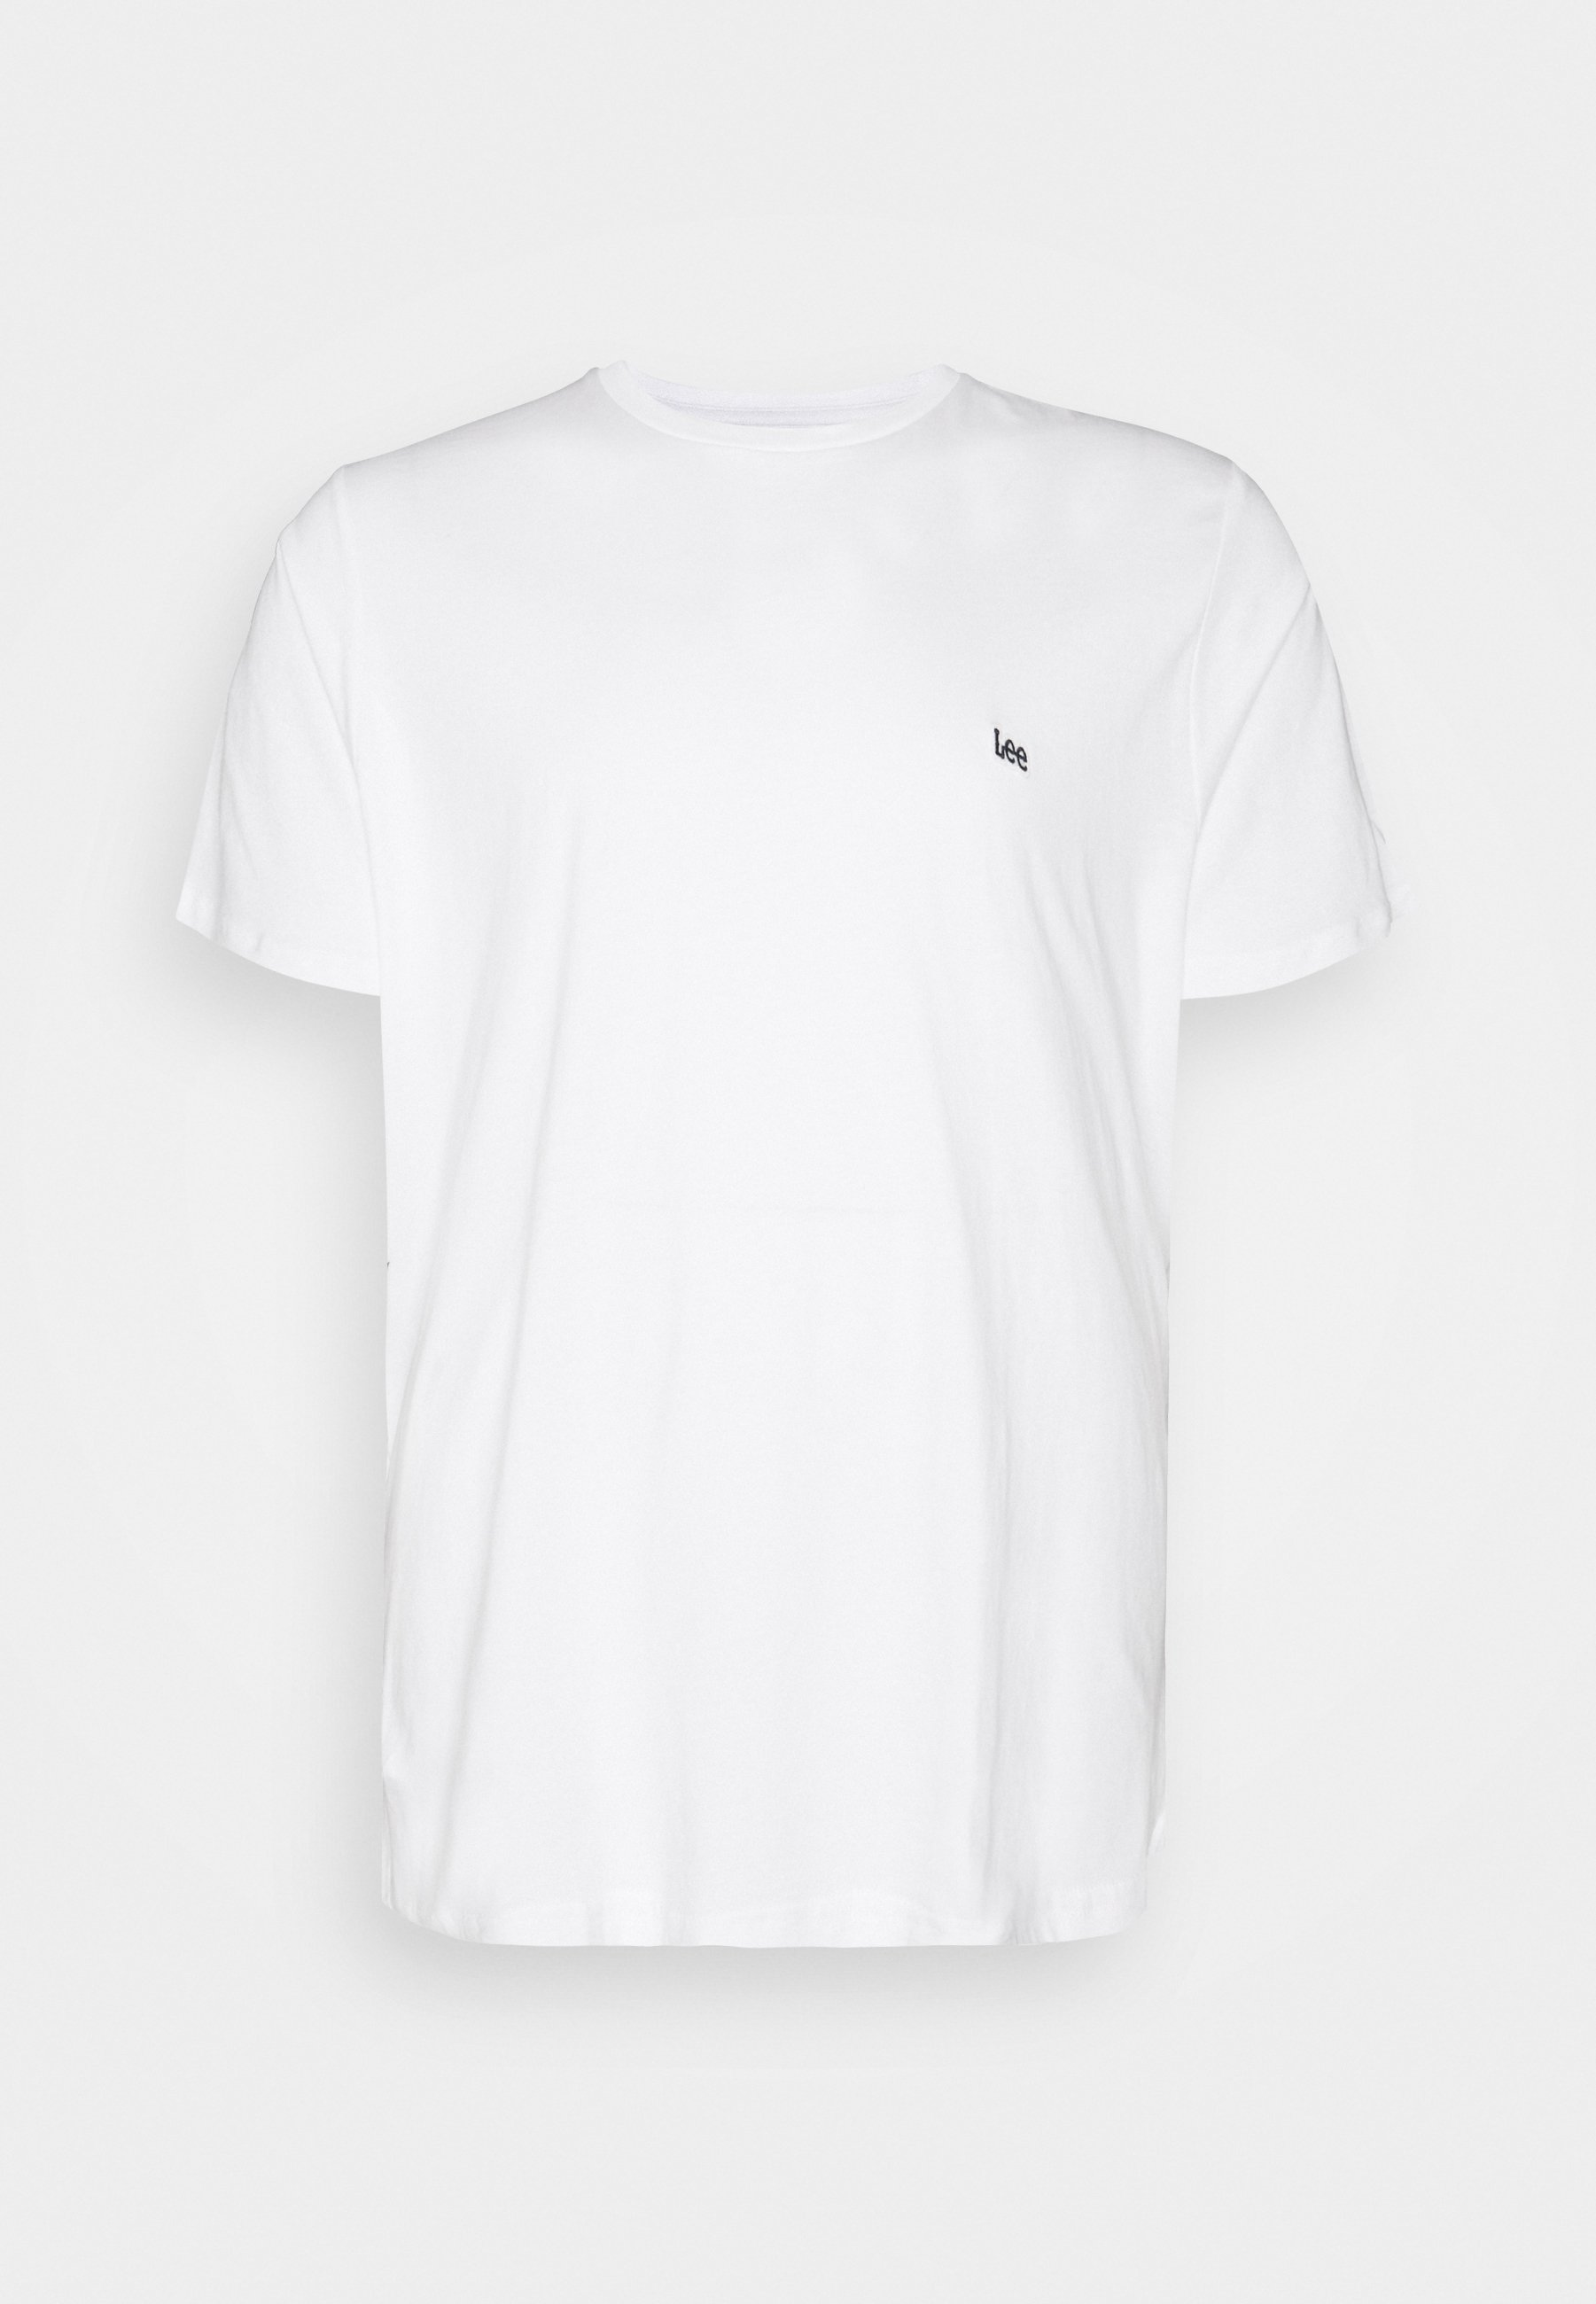 Homme PATCH LOGO TEE - T-shirt basique